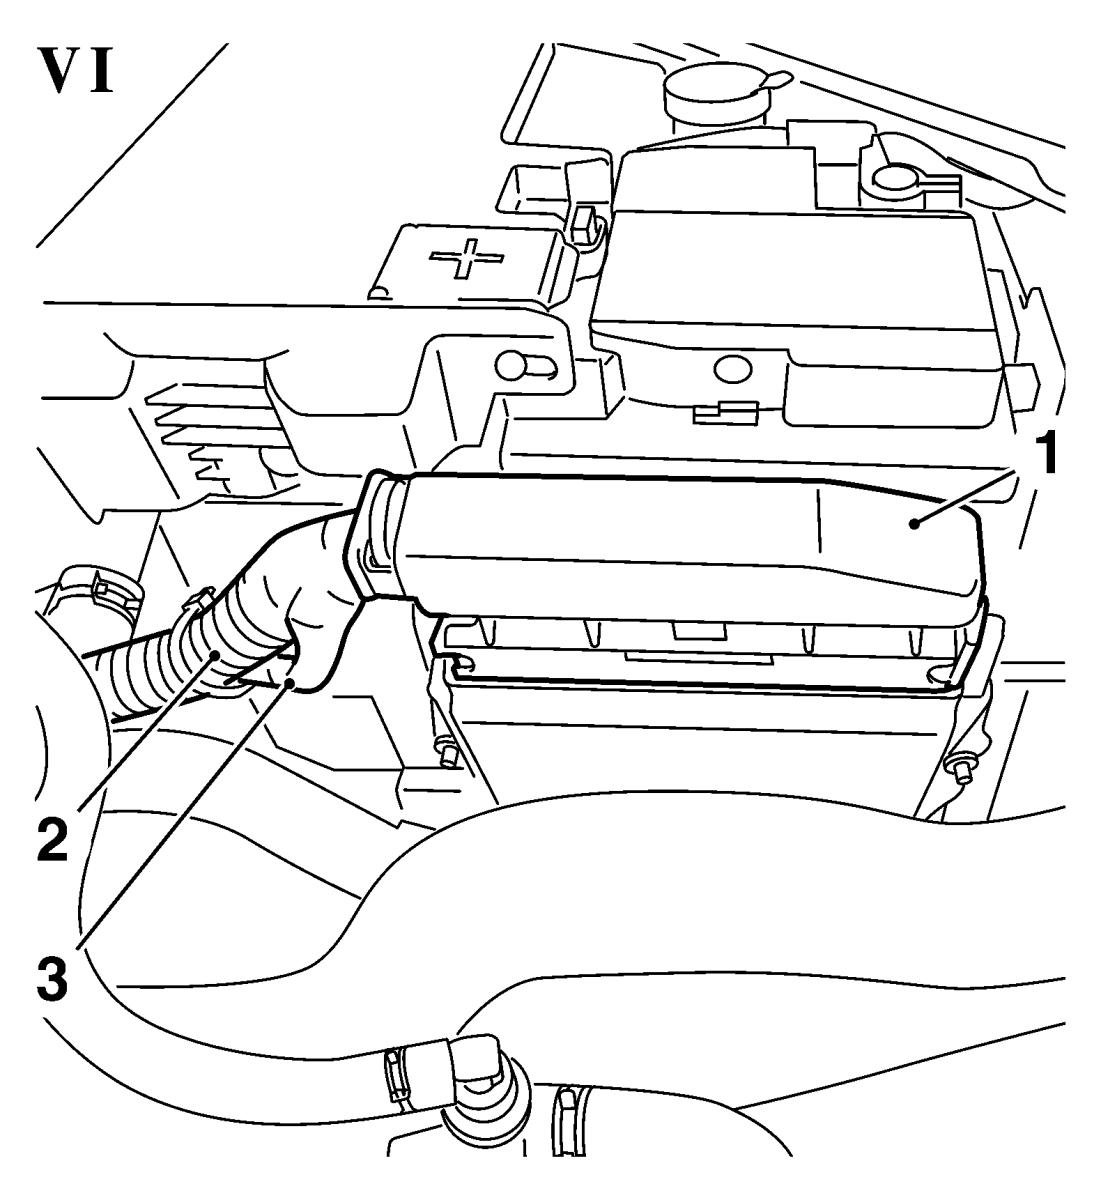 Gm Ecm Harness Connectors | Wiring Diagram Database